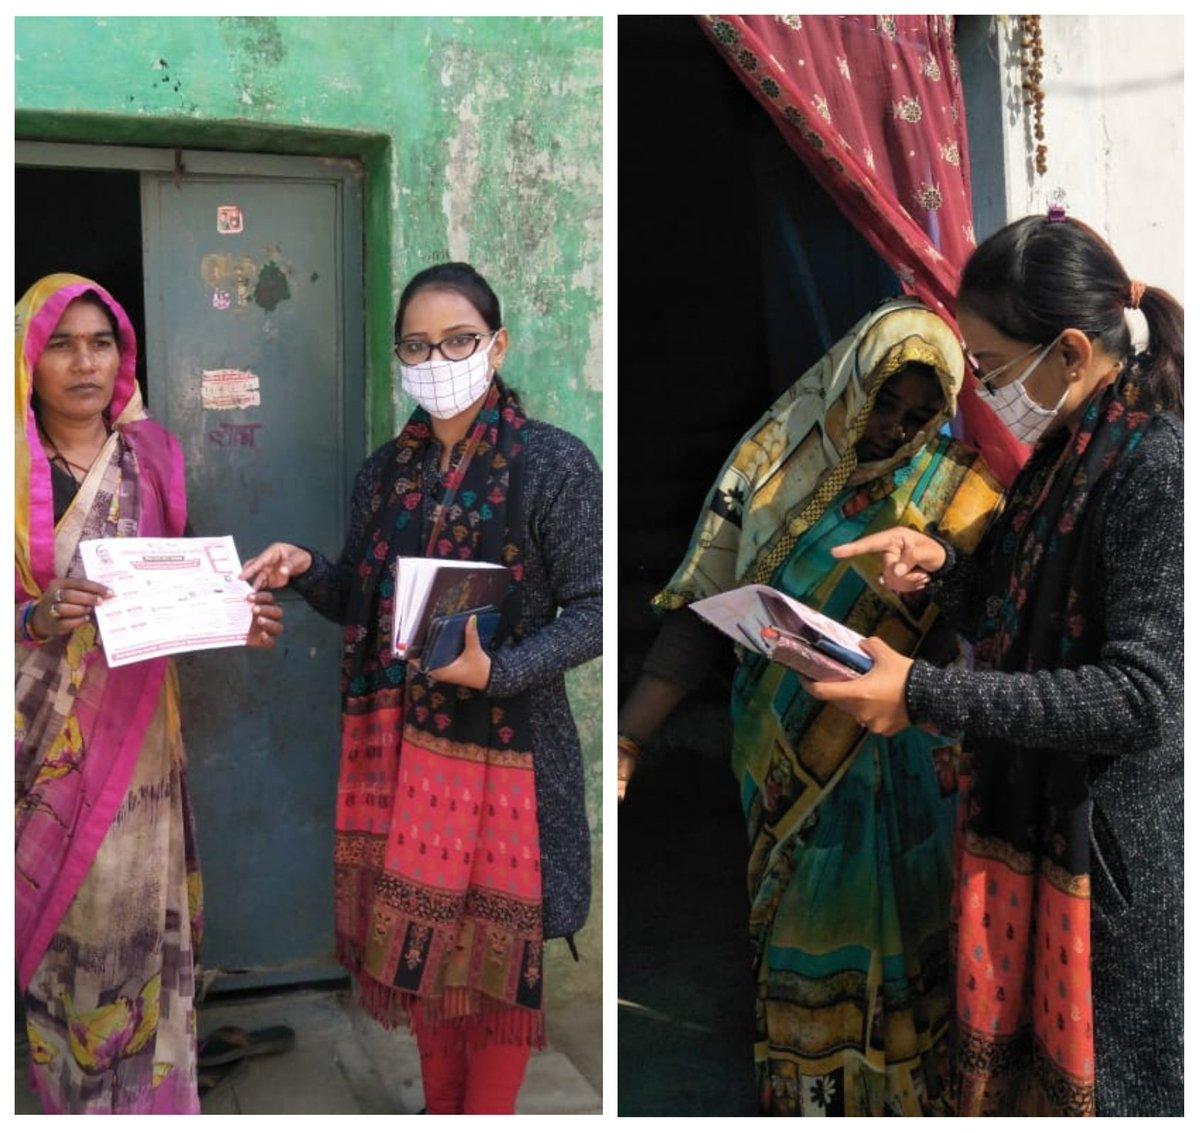 #EPathshala pamphlet distibution campaign in Gangapur village.   @myogiadityanath @EduMinOfIndia @SarvendraEdu @drdwivedisatish @DM_MIRZAPUR @basicshiksha_up  @DDUttarPradesh @suvashojhaG @EducationMirror @School__Bank @shikshansamvad